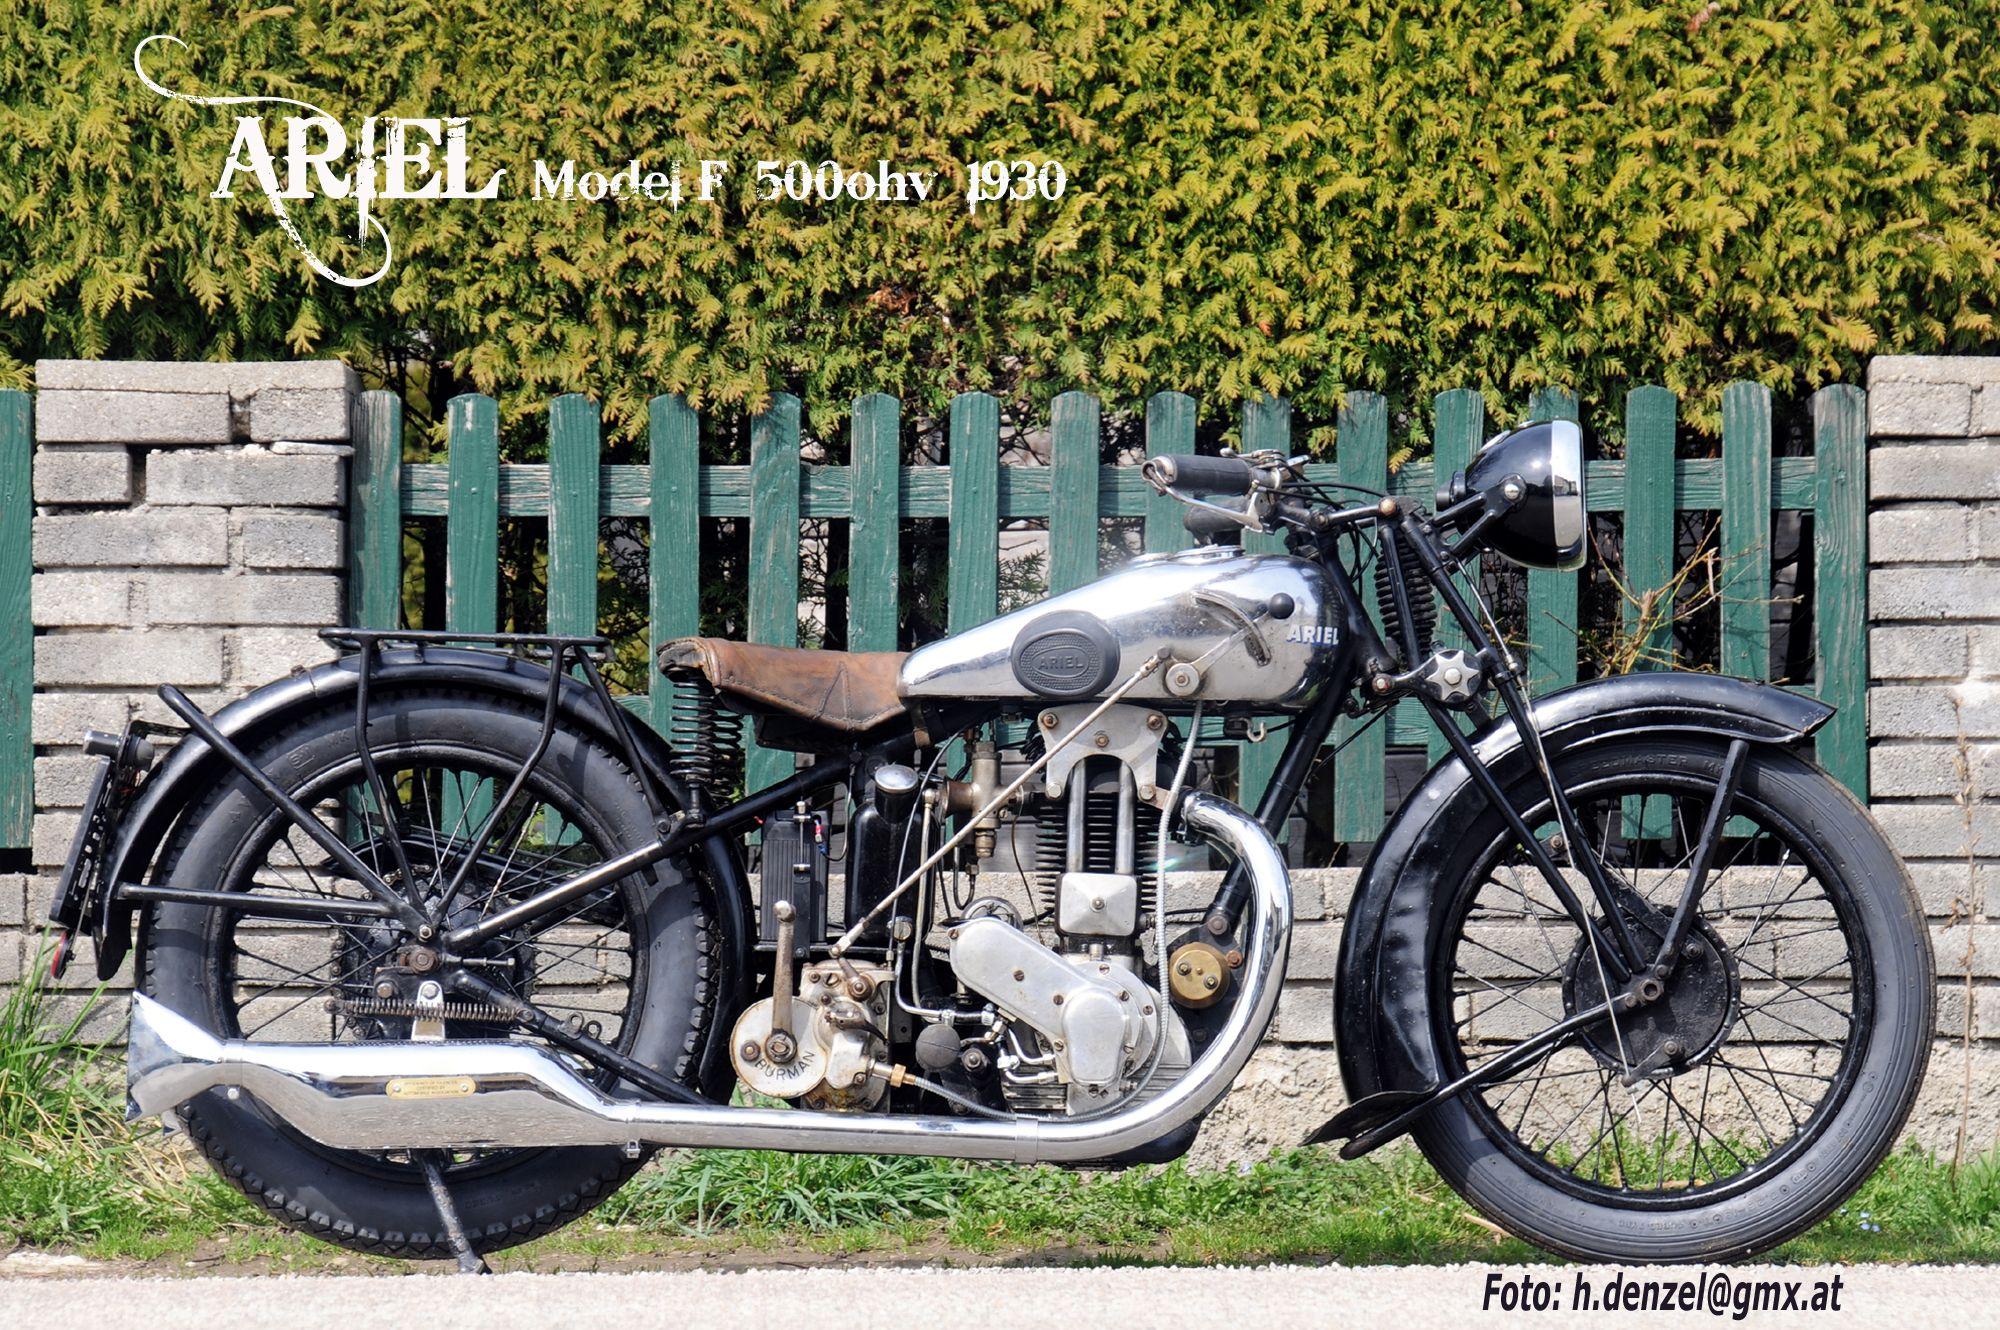 Ariel Model F 500ohv 1930 Motorbikes Motorcycle Moped